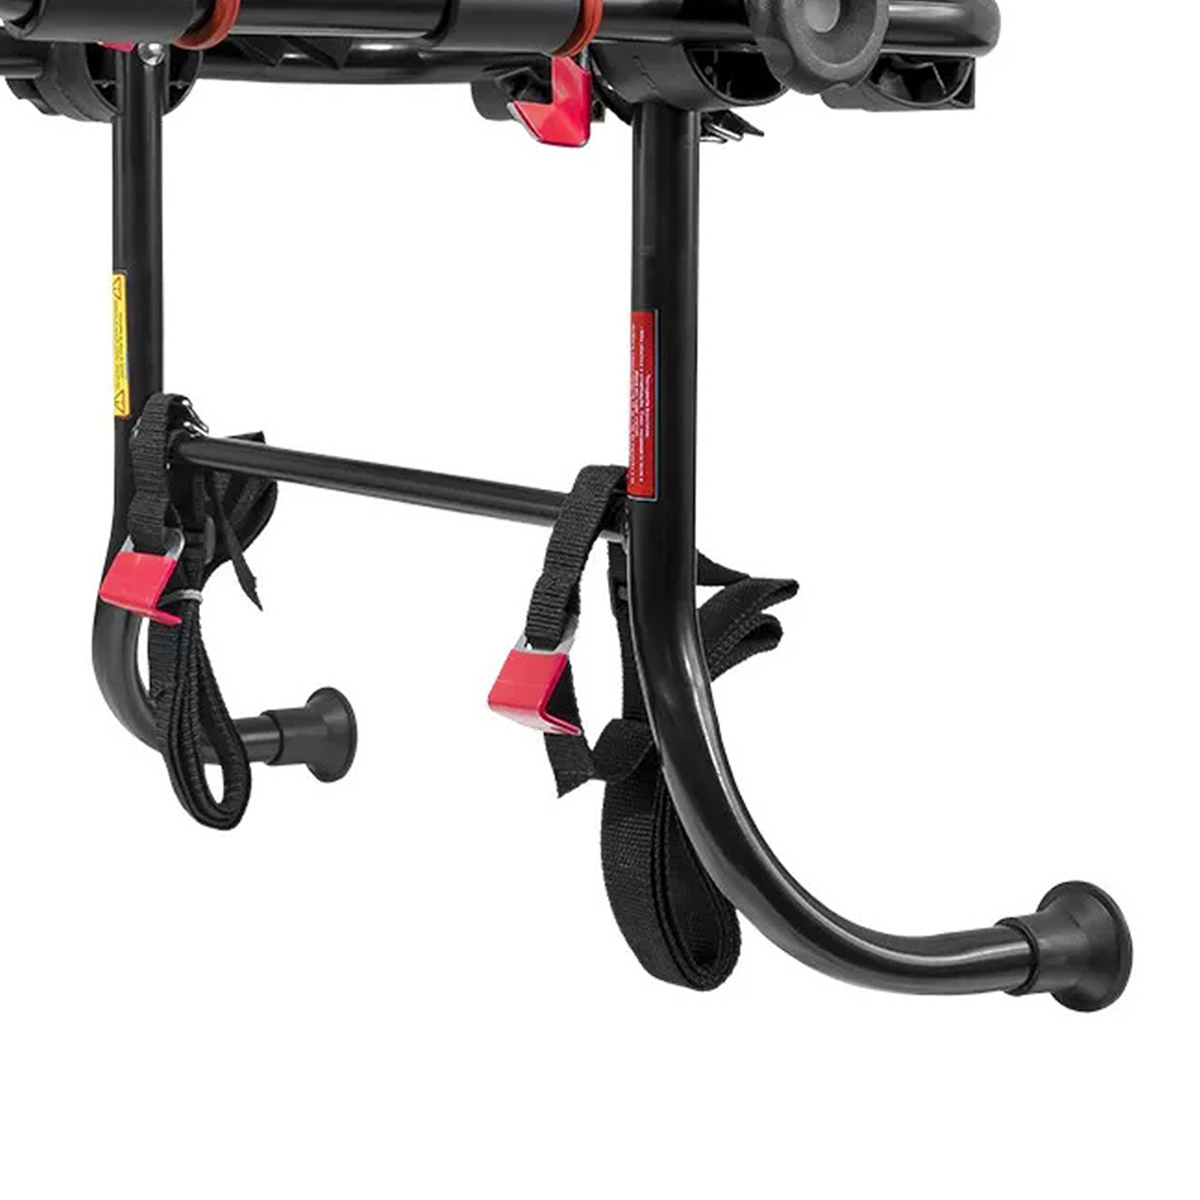 Suporte Bicicleta Carro Transbike Porta Mala POP Plus TRIP2B